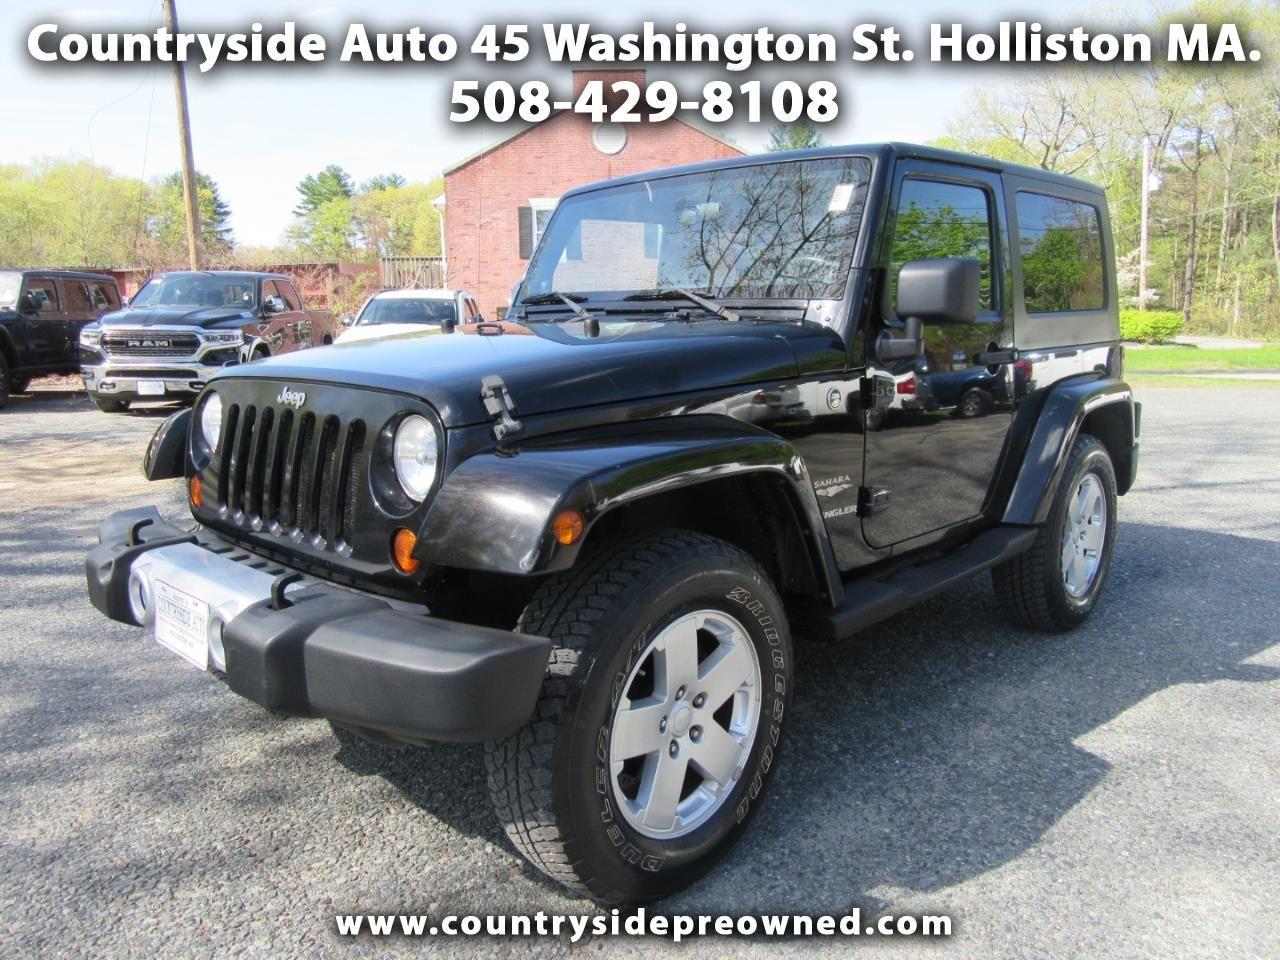 Used 2008 Jeep Wrangler Sahara for Sale in Holliston MA ...